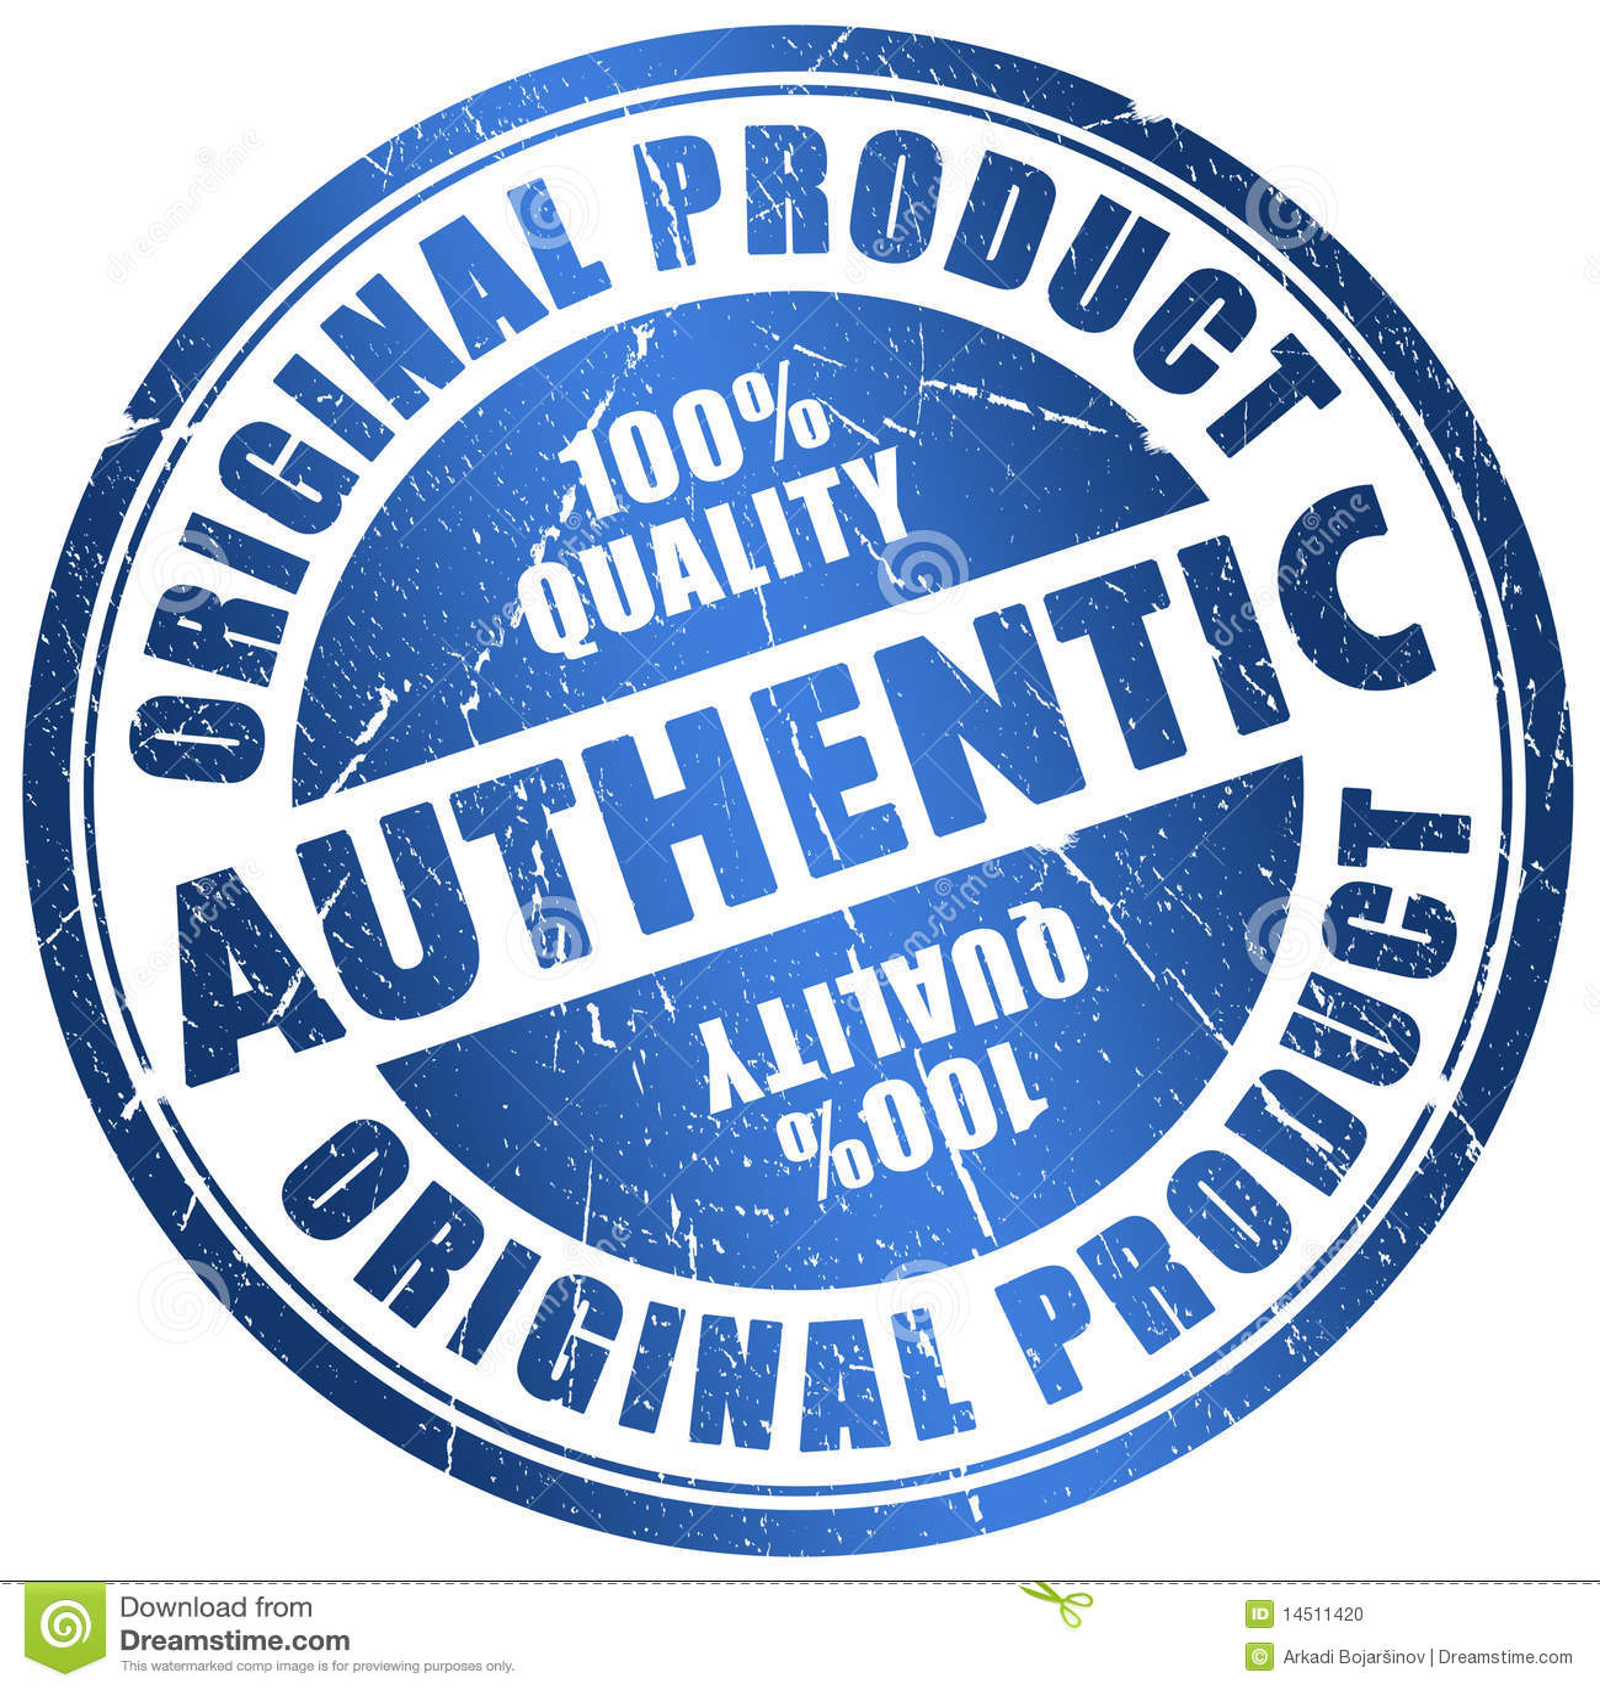 Authentic Stamp Stock Photo - Image: 14511420